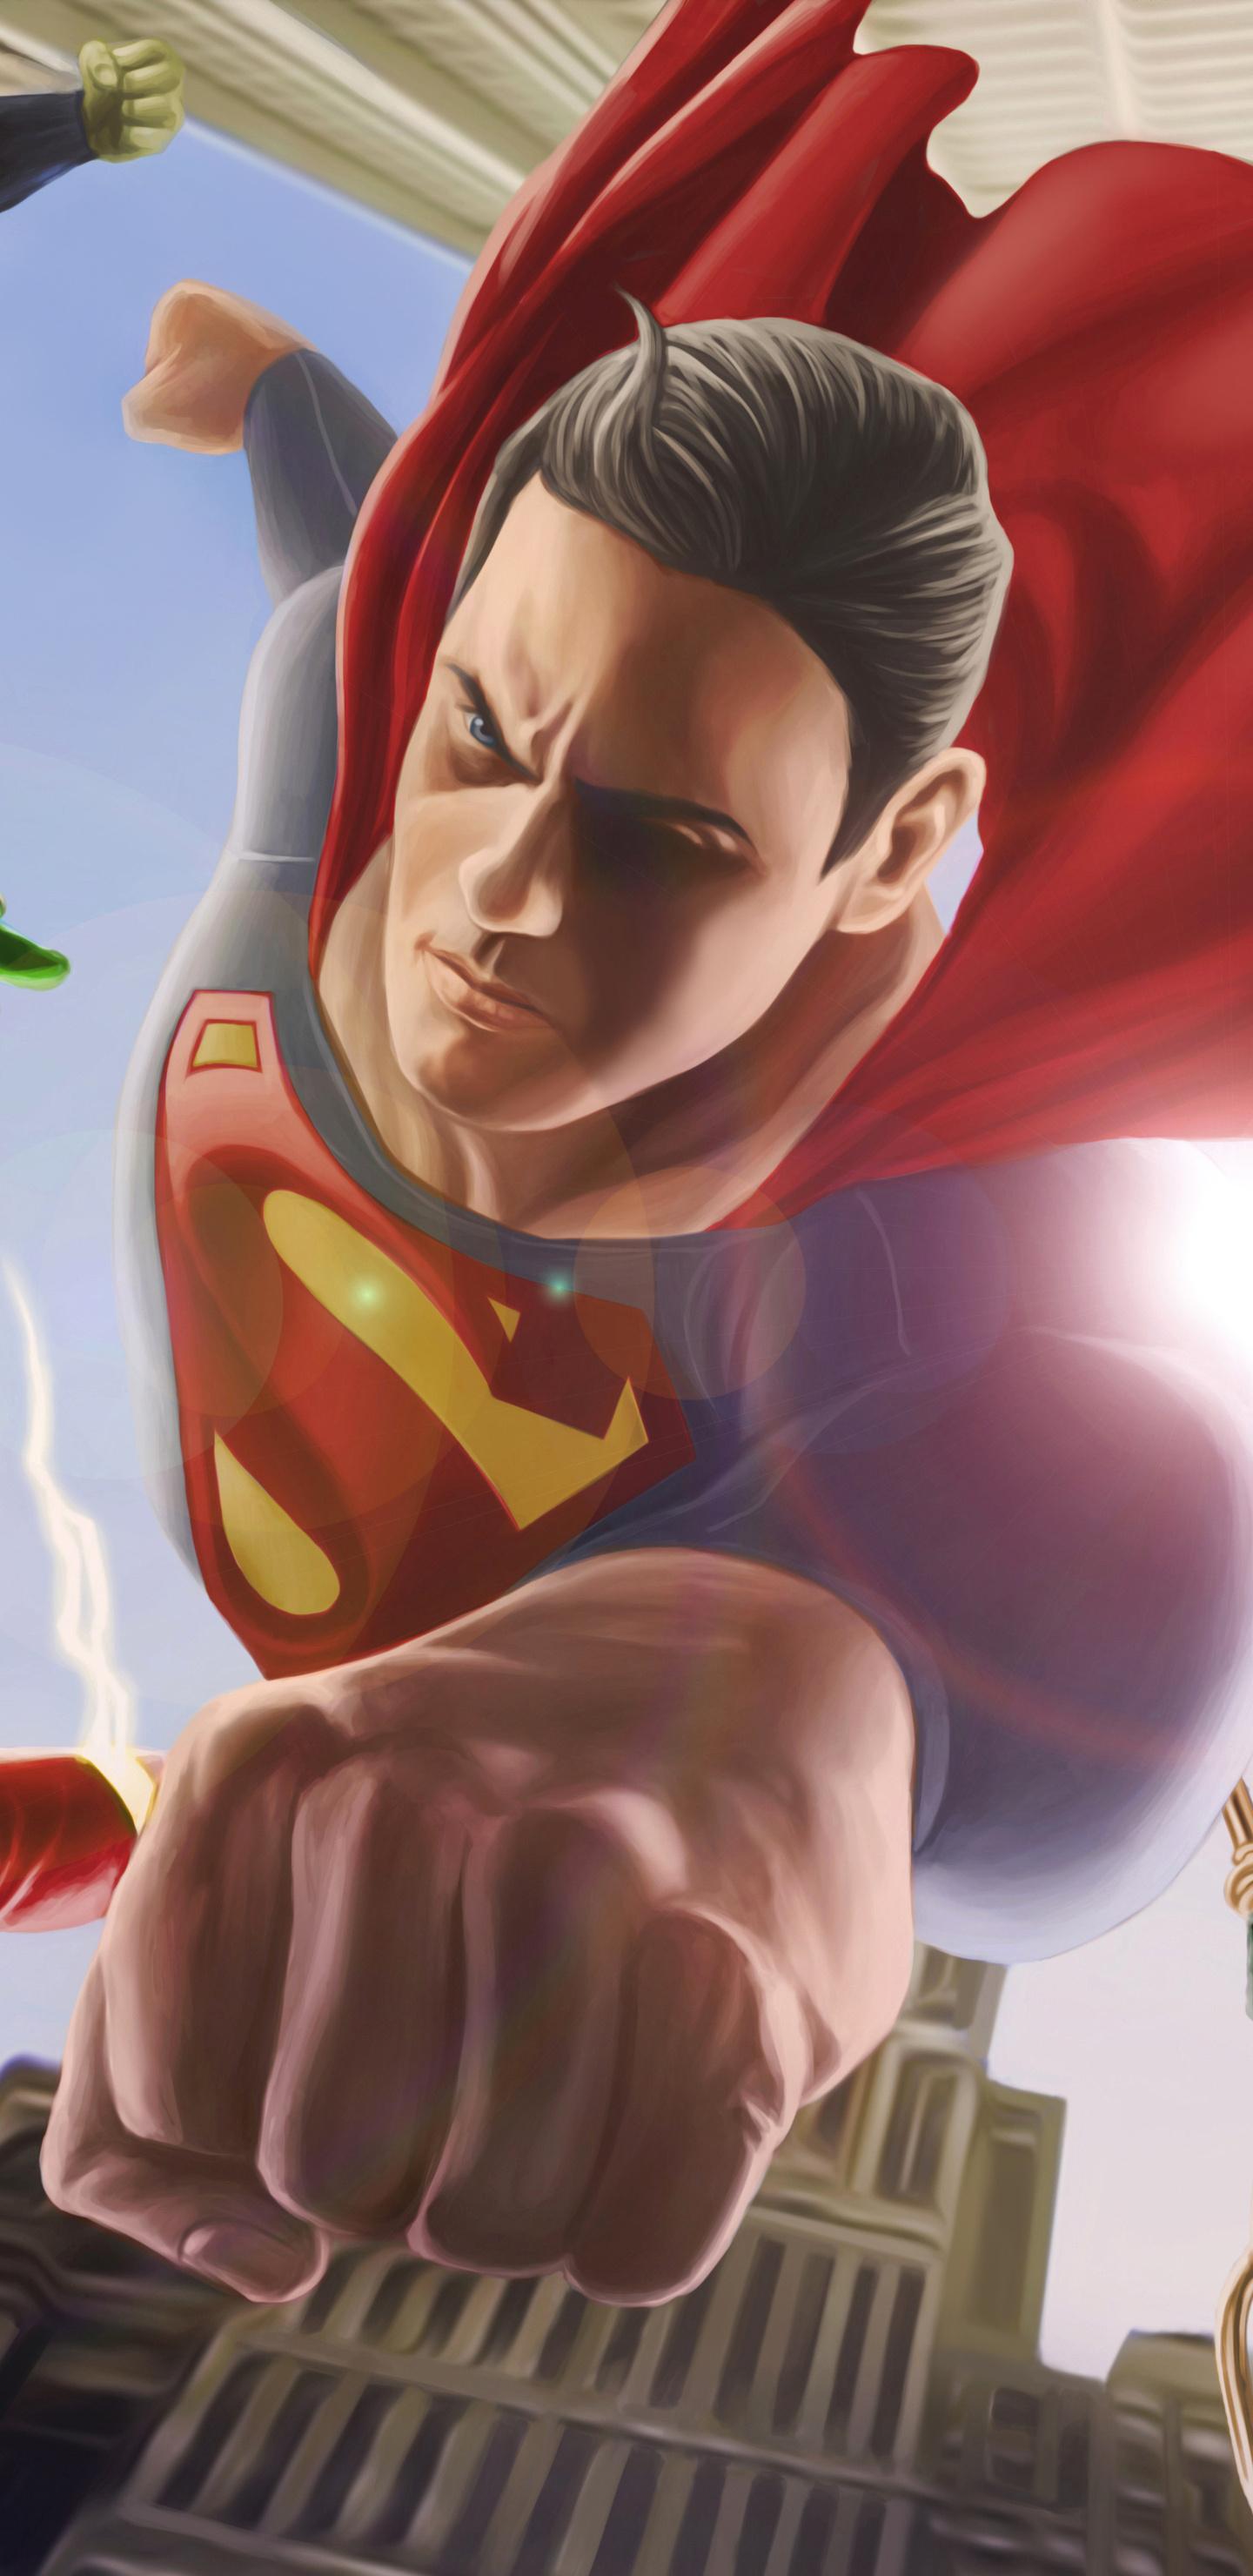 justice-league-artwork-8k-5e.jpg